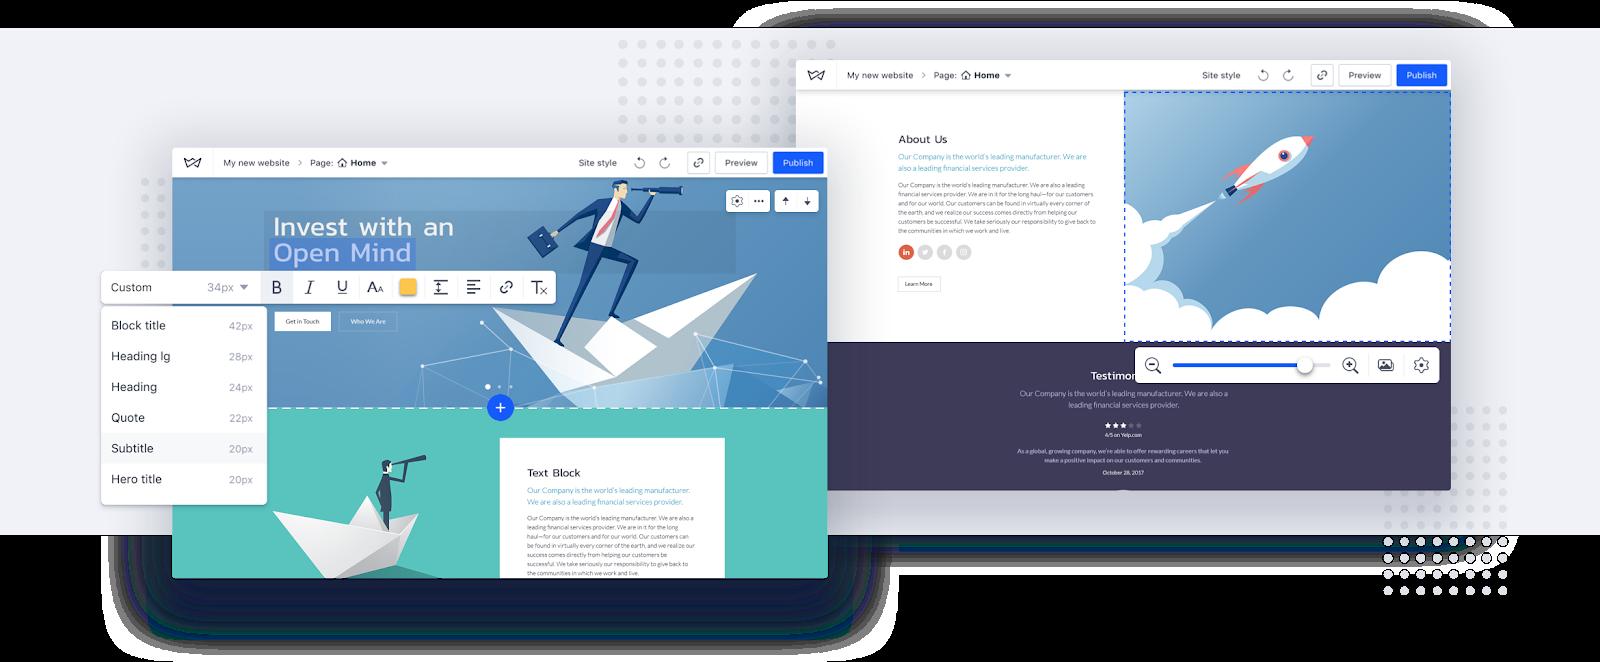 Buy Software Apps - Lifetime Deal Weblium content